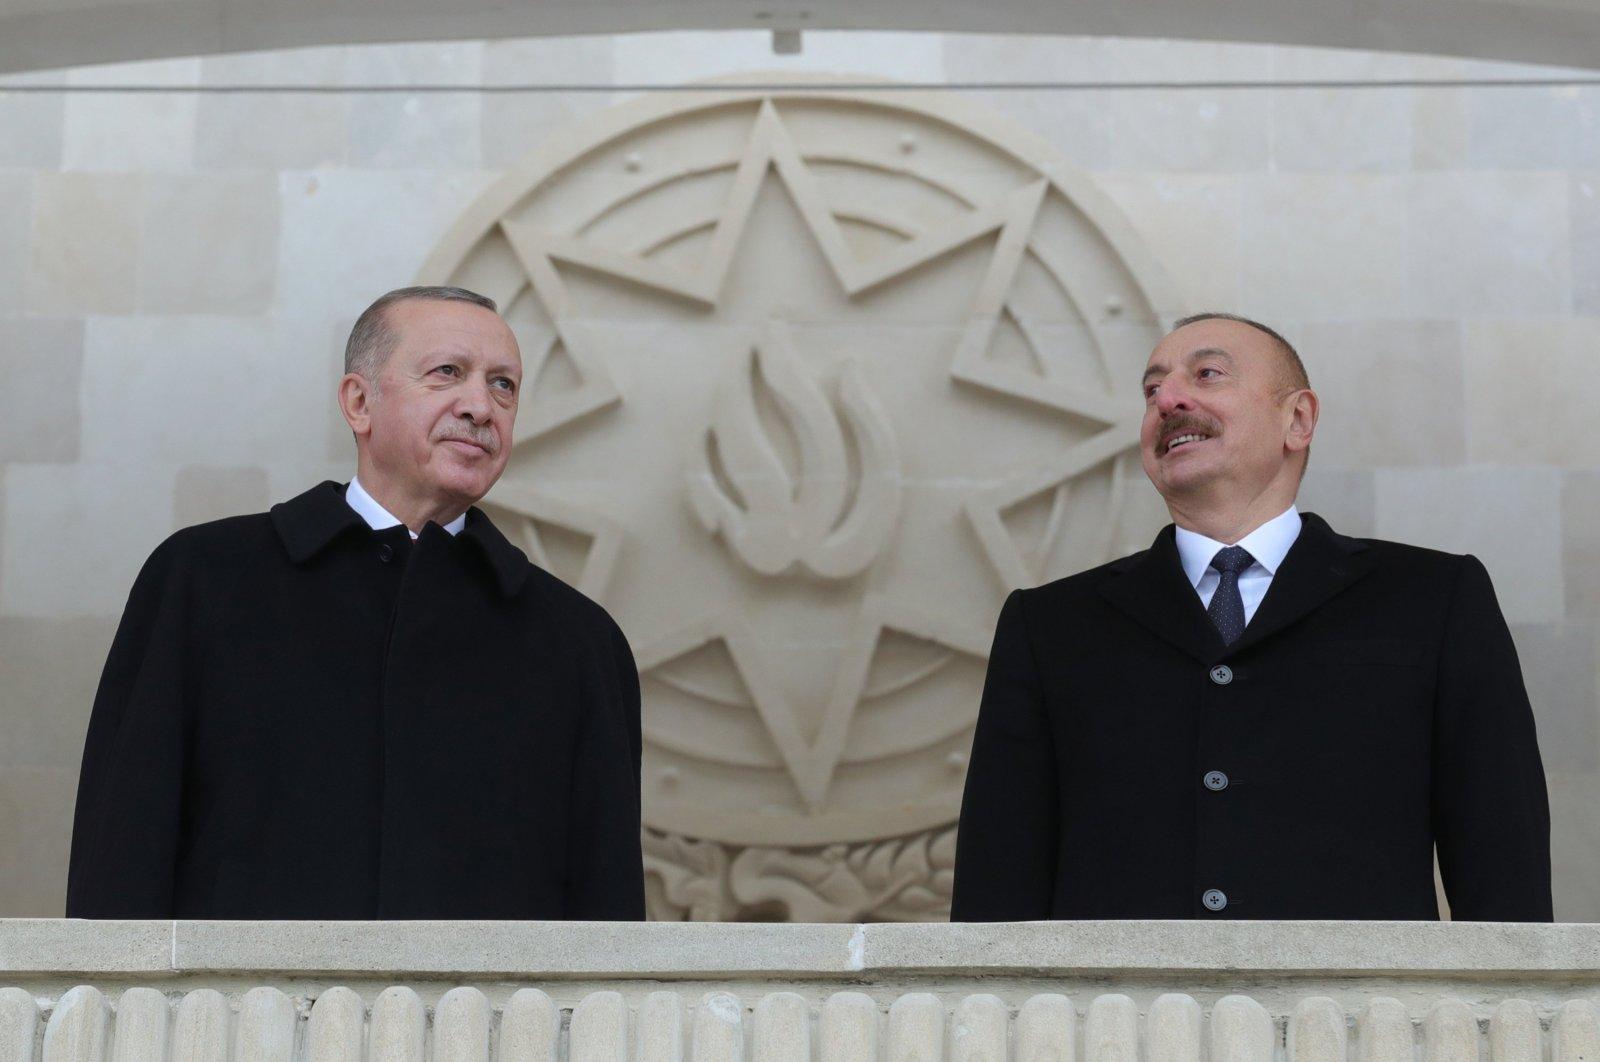 President Recep Tayyip Erdoğan (L) with Azerbaijani President Ilham Aliyev stand together in Baku, Azerbaijan, Dec. 11, 2020. (AA Photo)